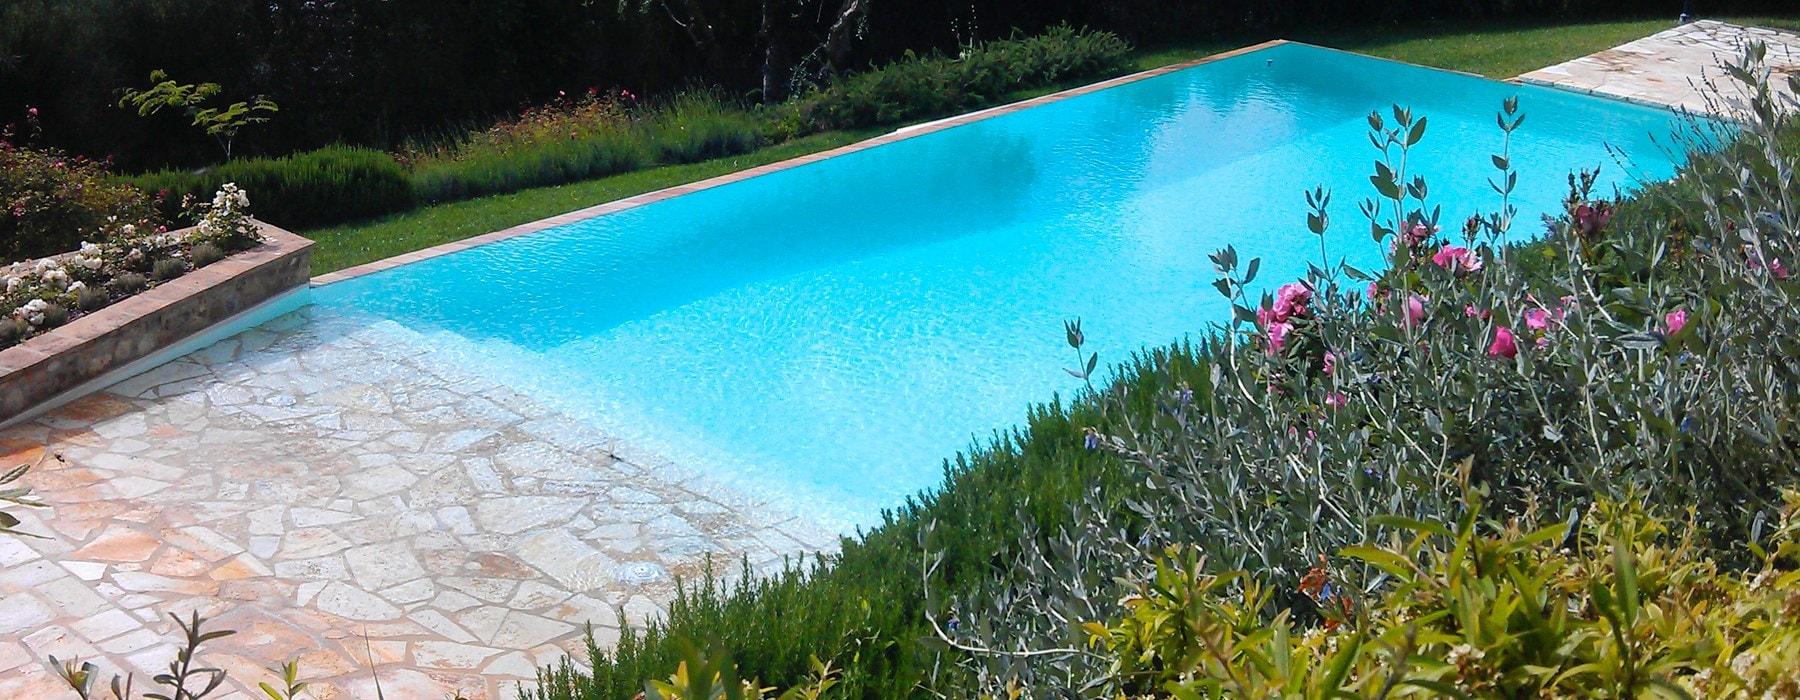 Home garden pool realizzazione piscine in toscana - Piscine interrate firenze ...